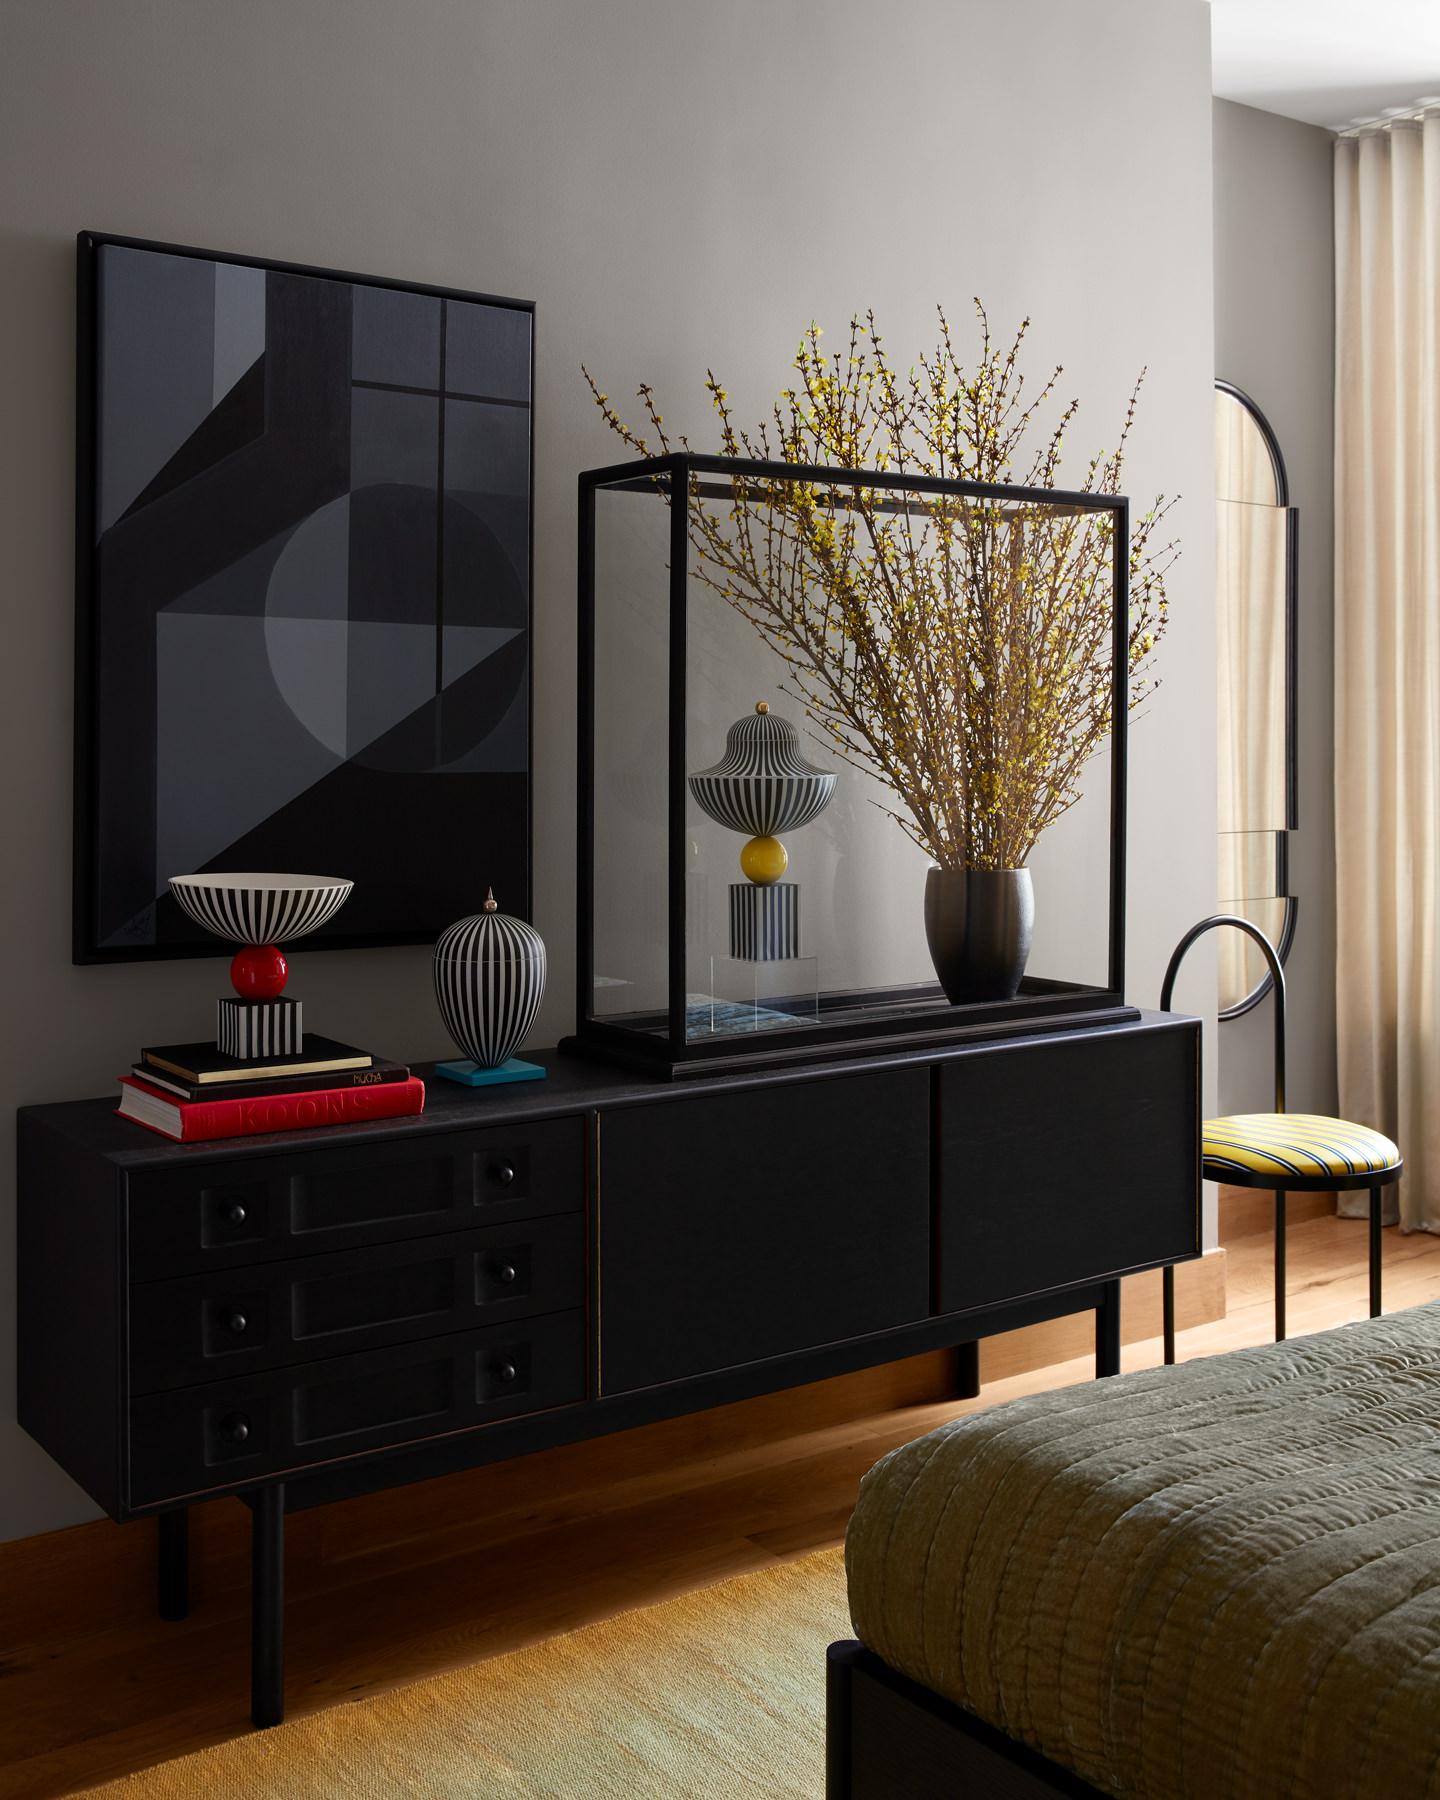 Lee Broom Penthouse New York Guest Bedroom Photo Stephen Kent Johnson Yellowtrace 22